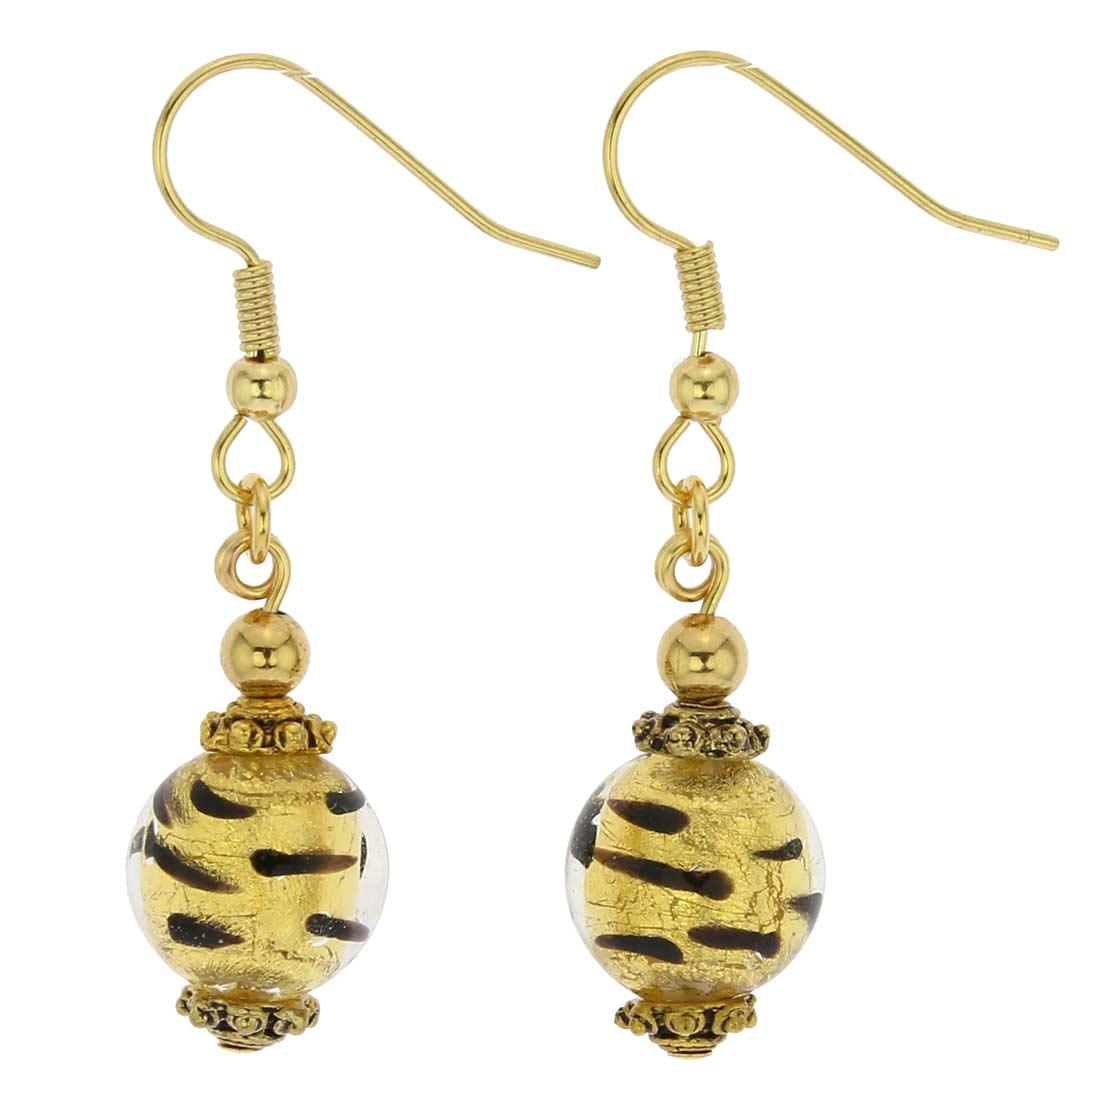 Antico Tesoro Balls Earrings - Spotted Gold